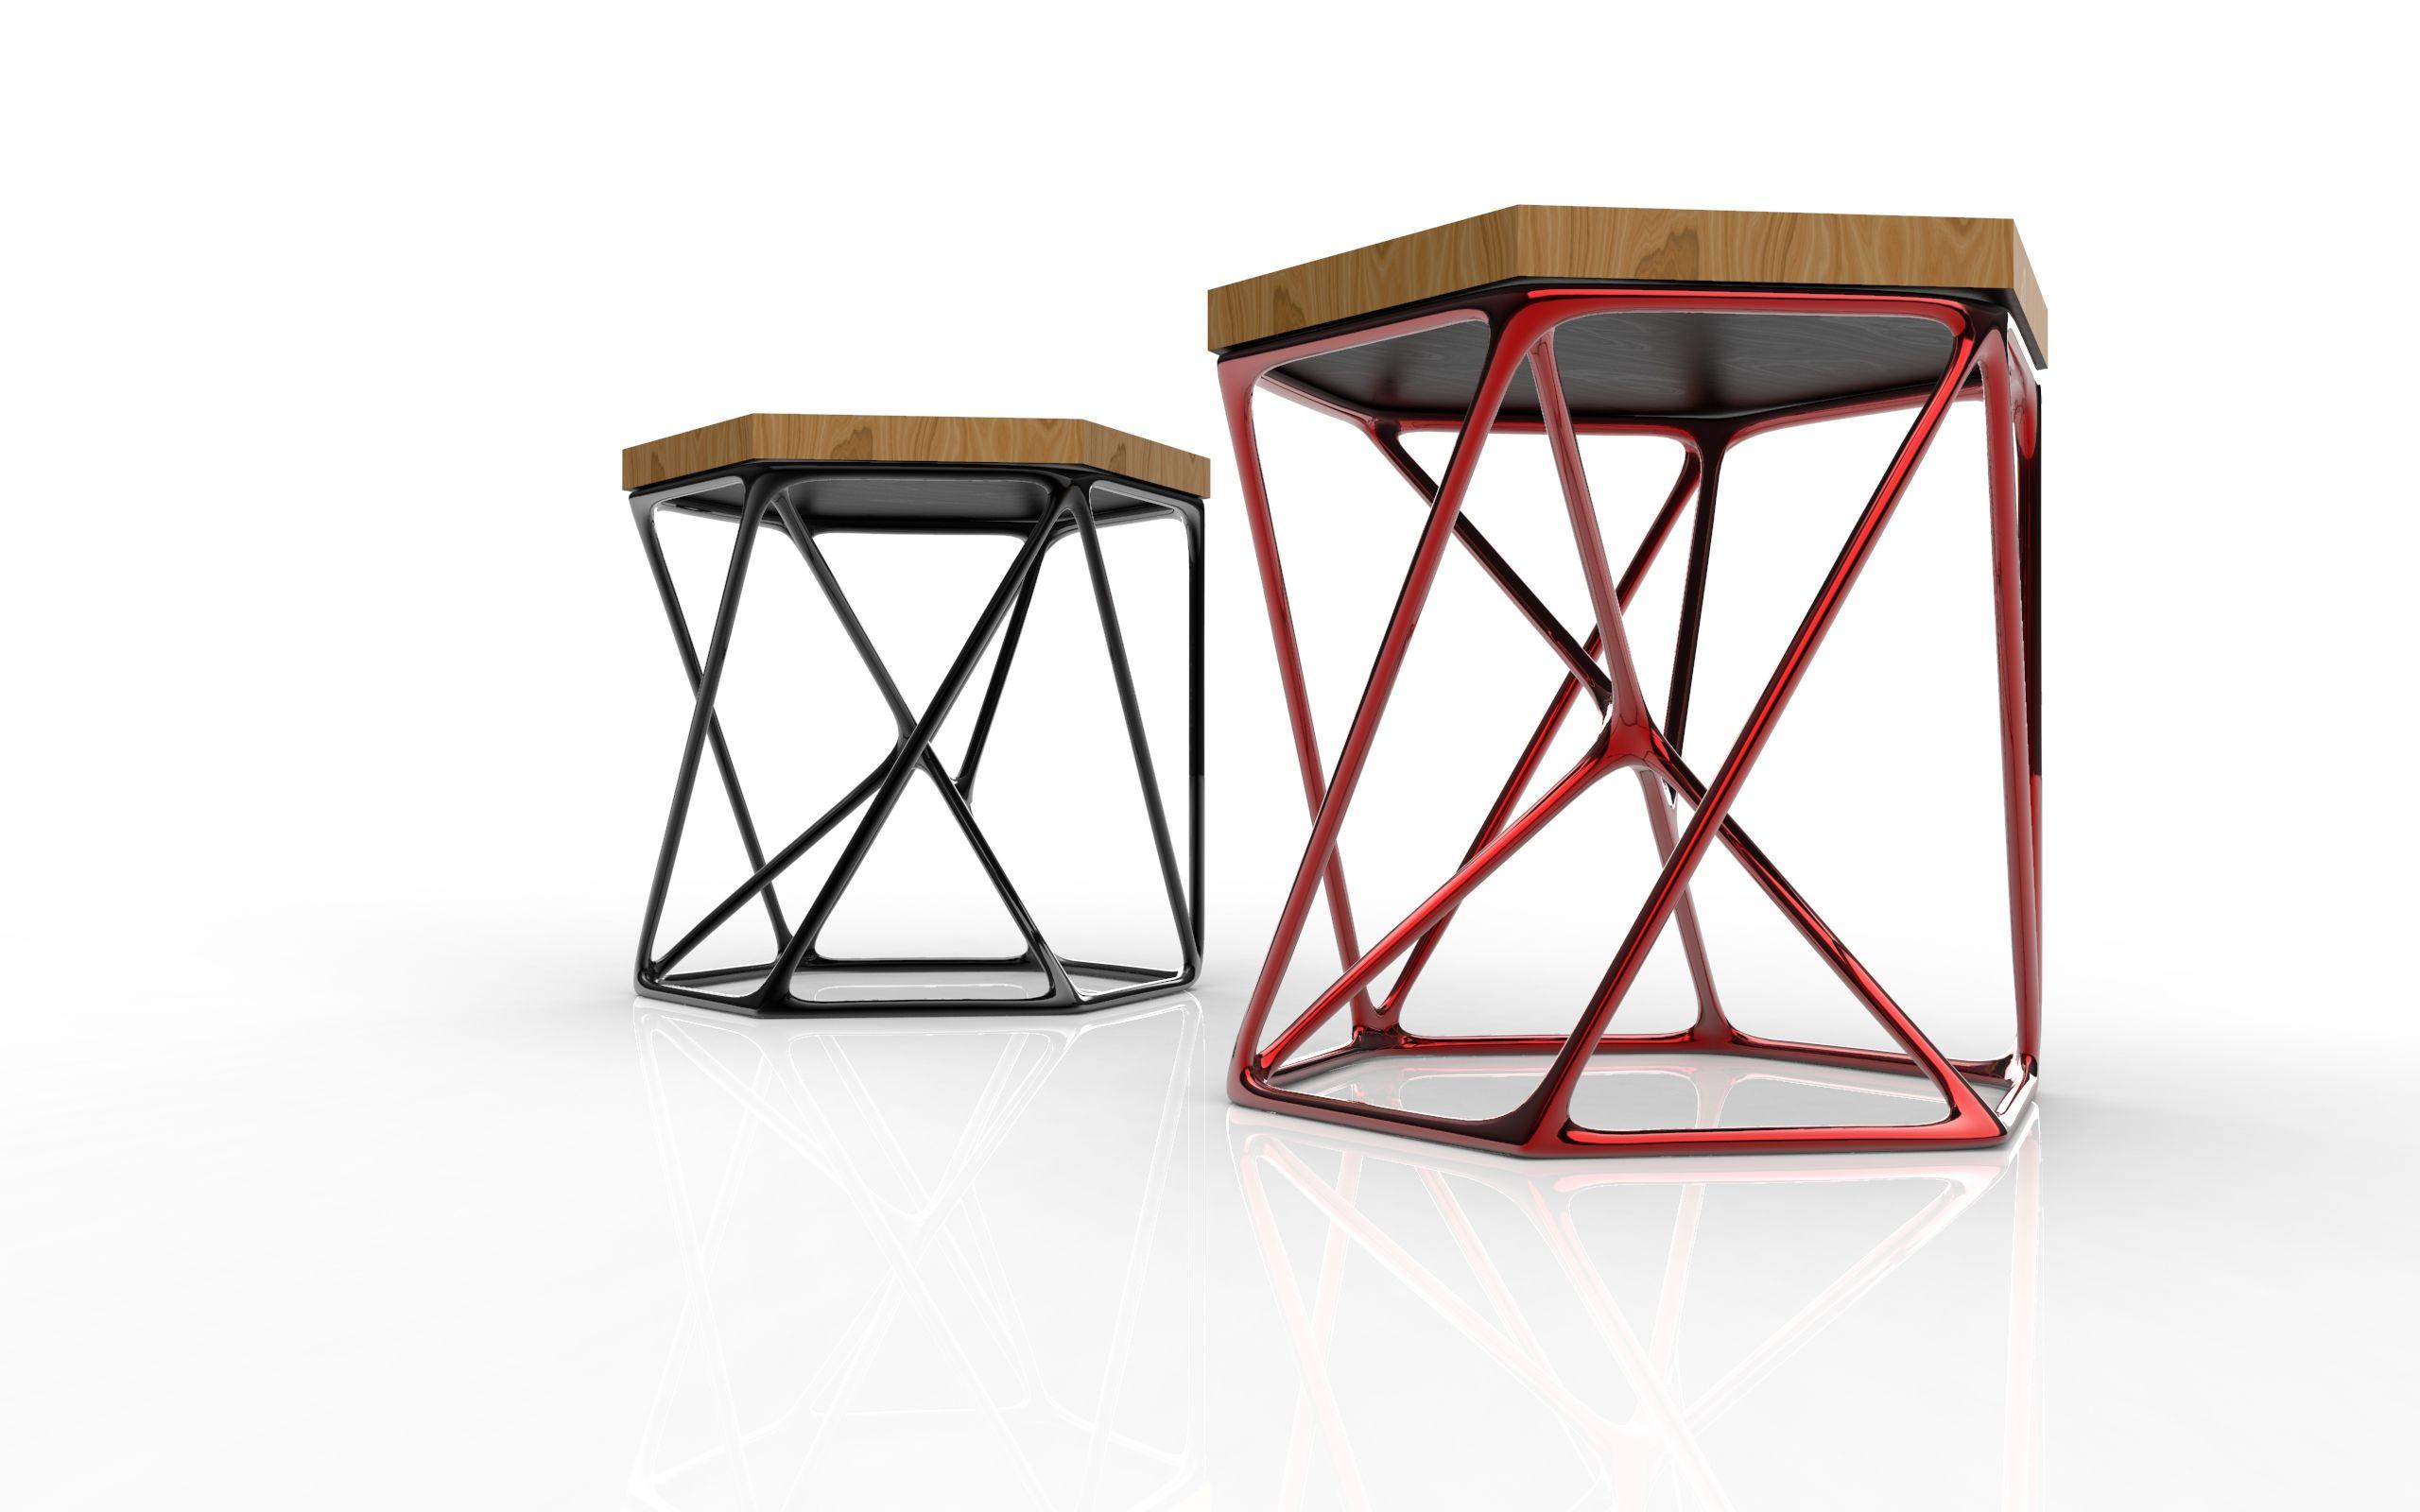 Fabrica-de-nerdes---design-ind2-lcs19-makers-3500-3500